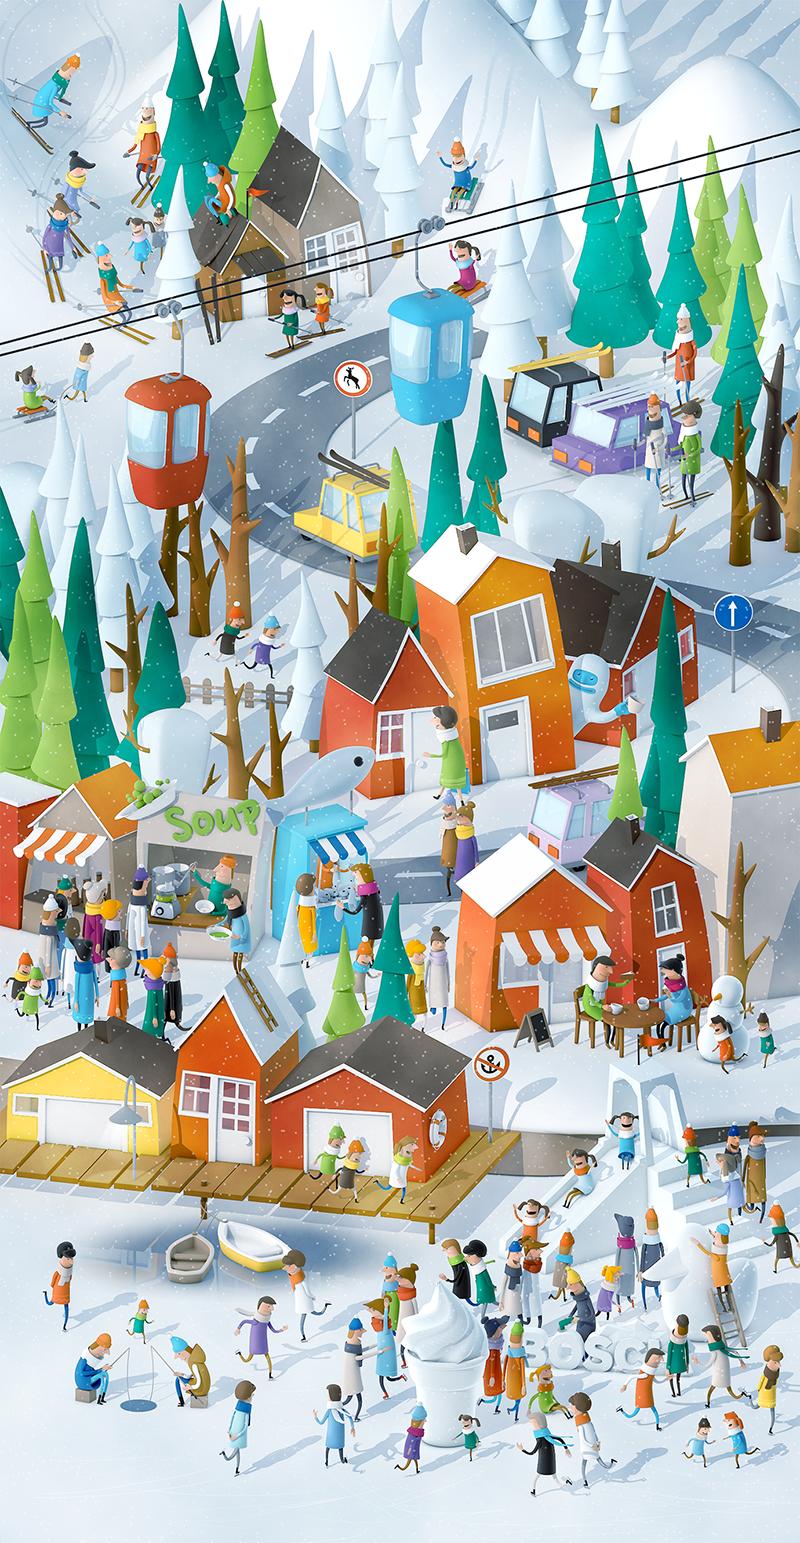 Winter Village Full Png By Anna Paschenko Digital Art Illustration Illustration Winter Wonderland